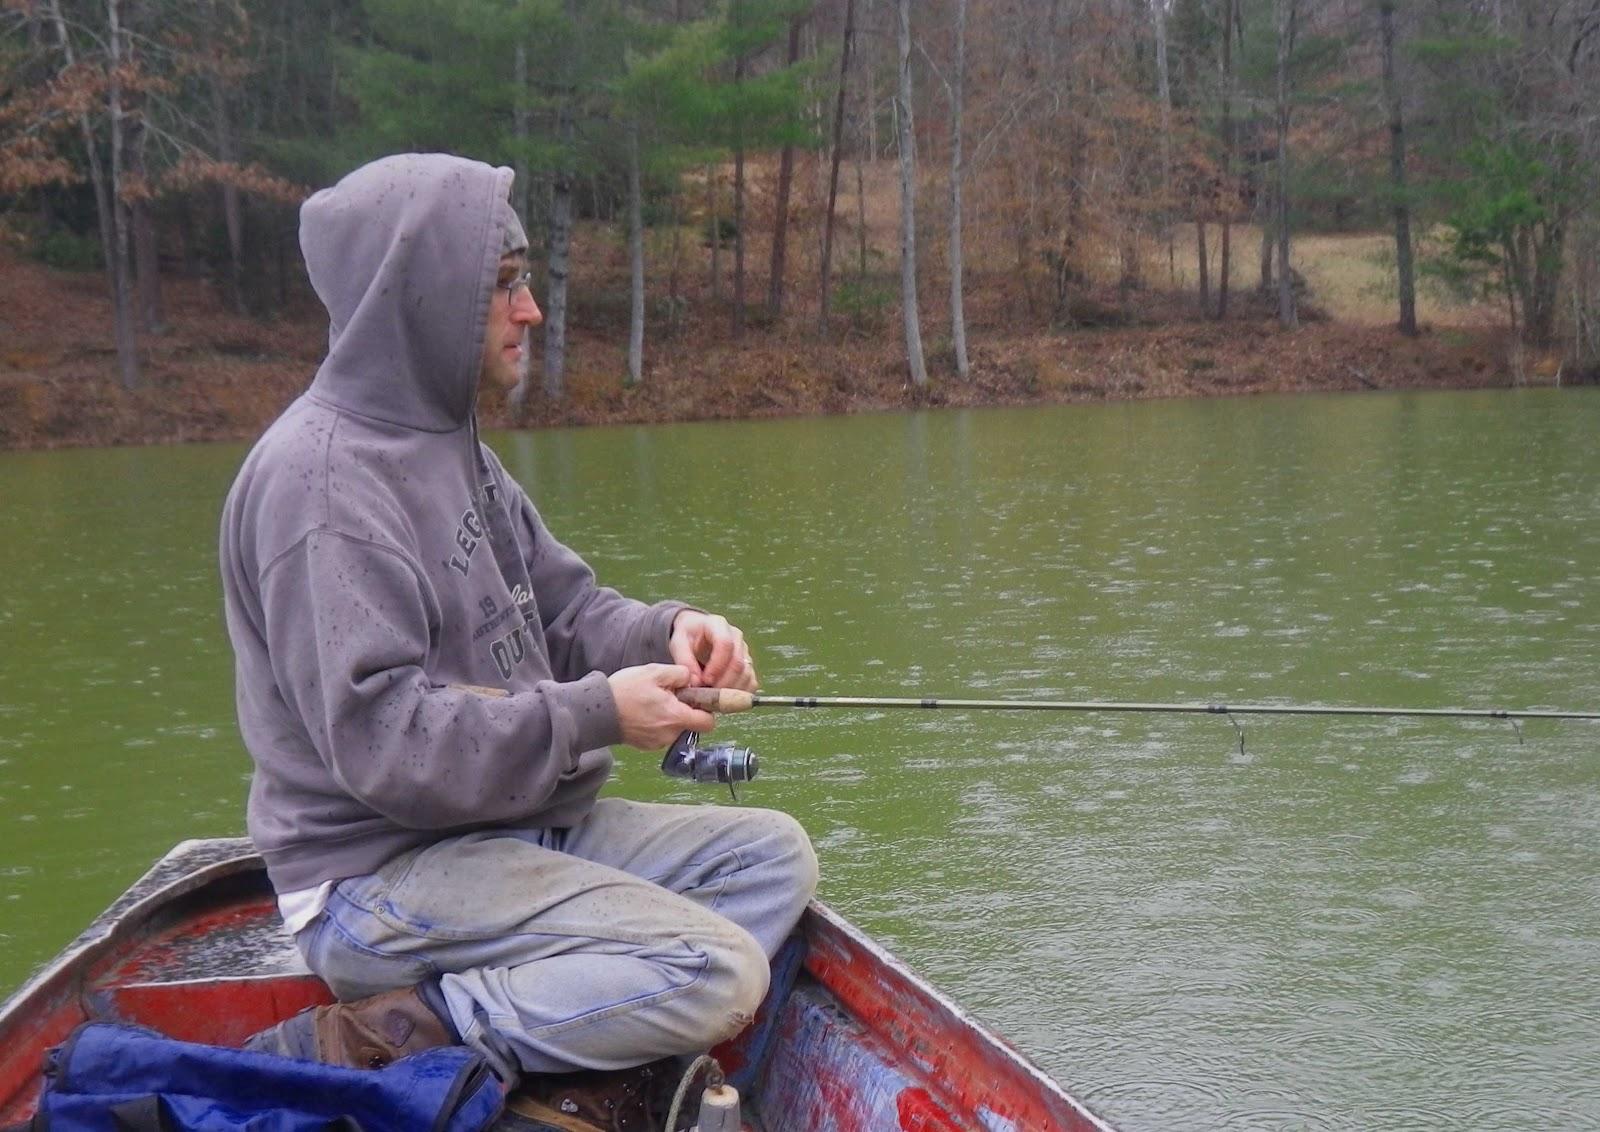 Jeff samsel fishing bass between rain showers for Bass fishing in the rain